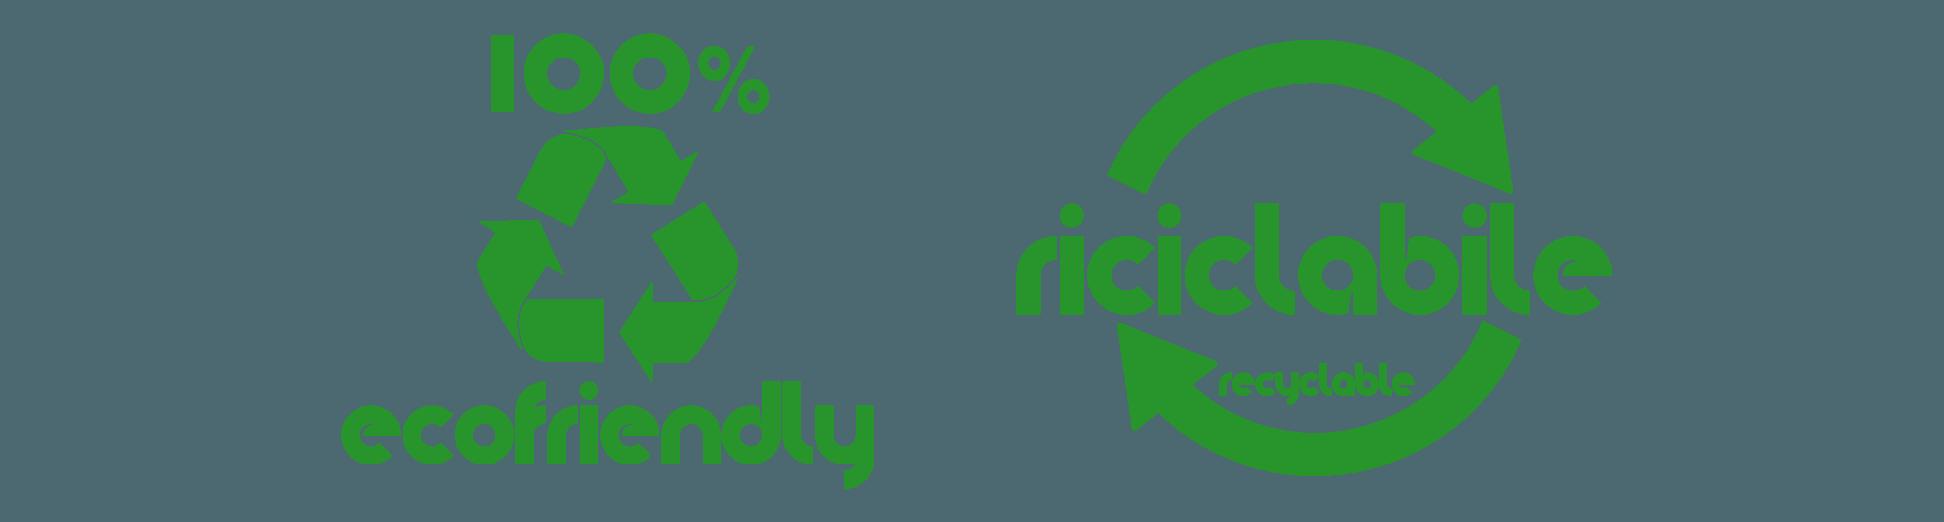 logo 100% ecofriendly - riciclabile